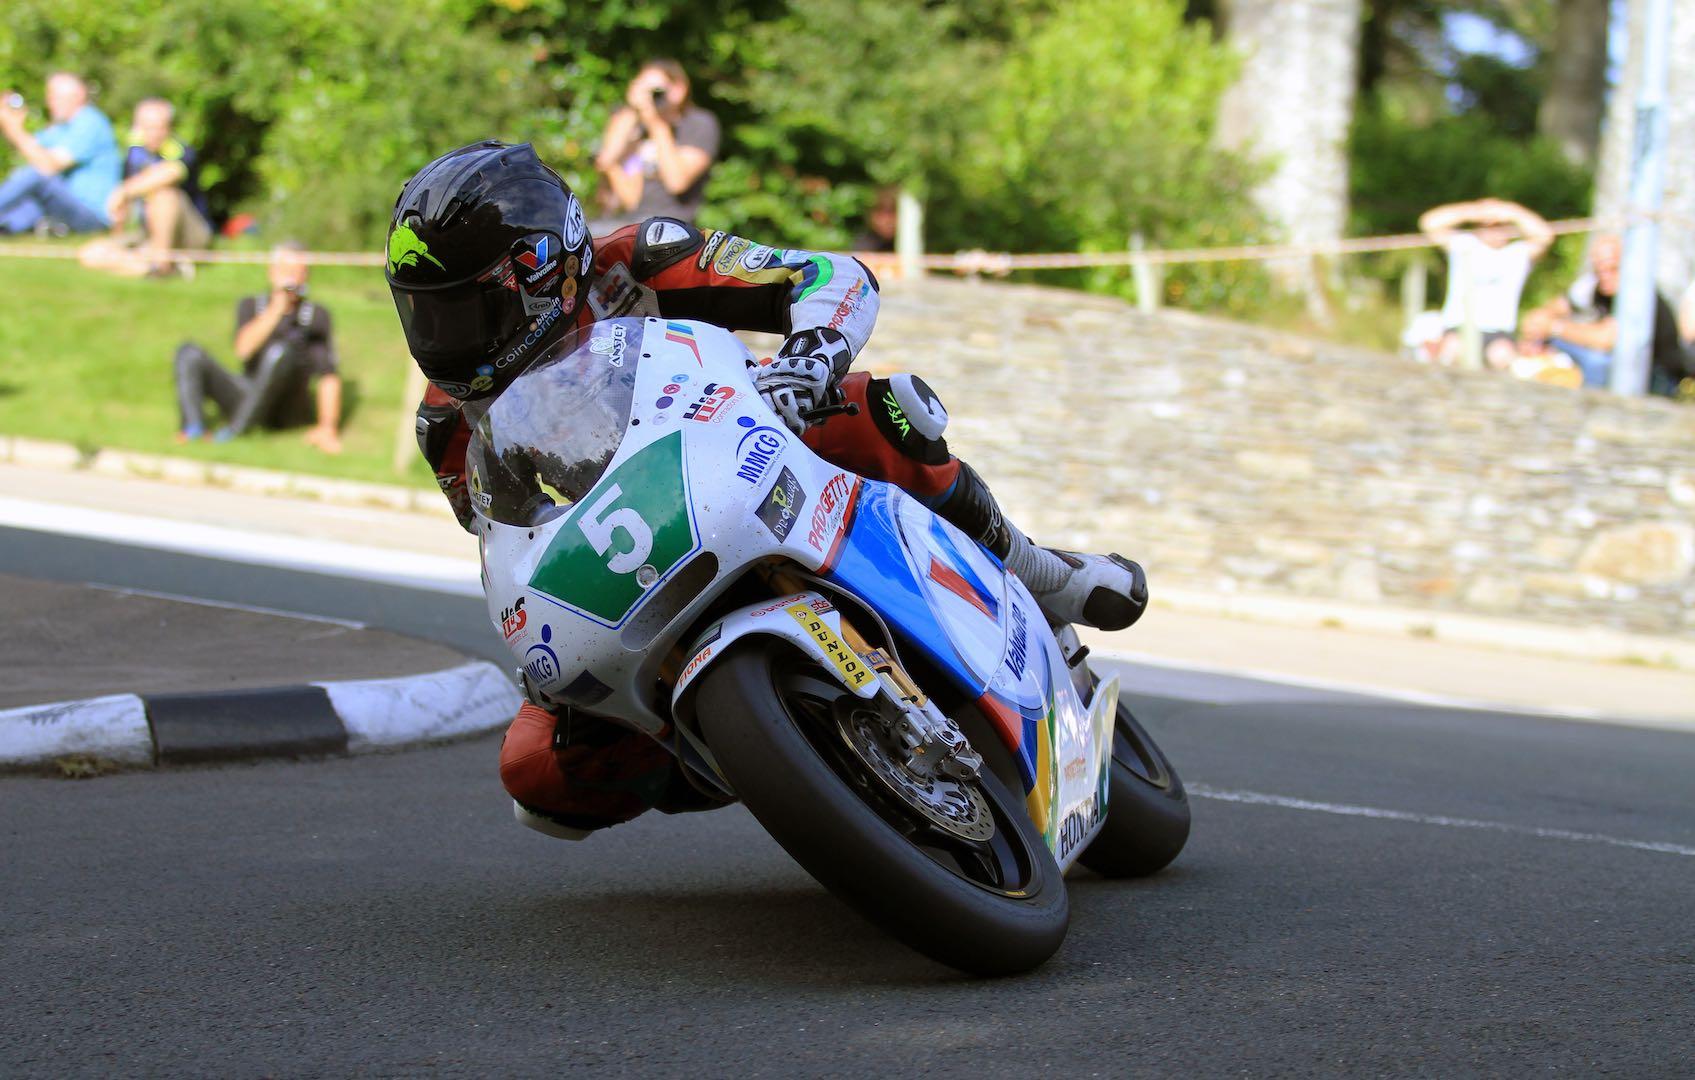 2016 Classic TT 250cc Lightweight   Honda's Anstey Claims Record Win